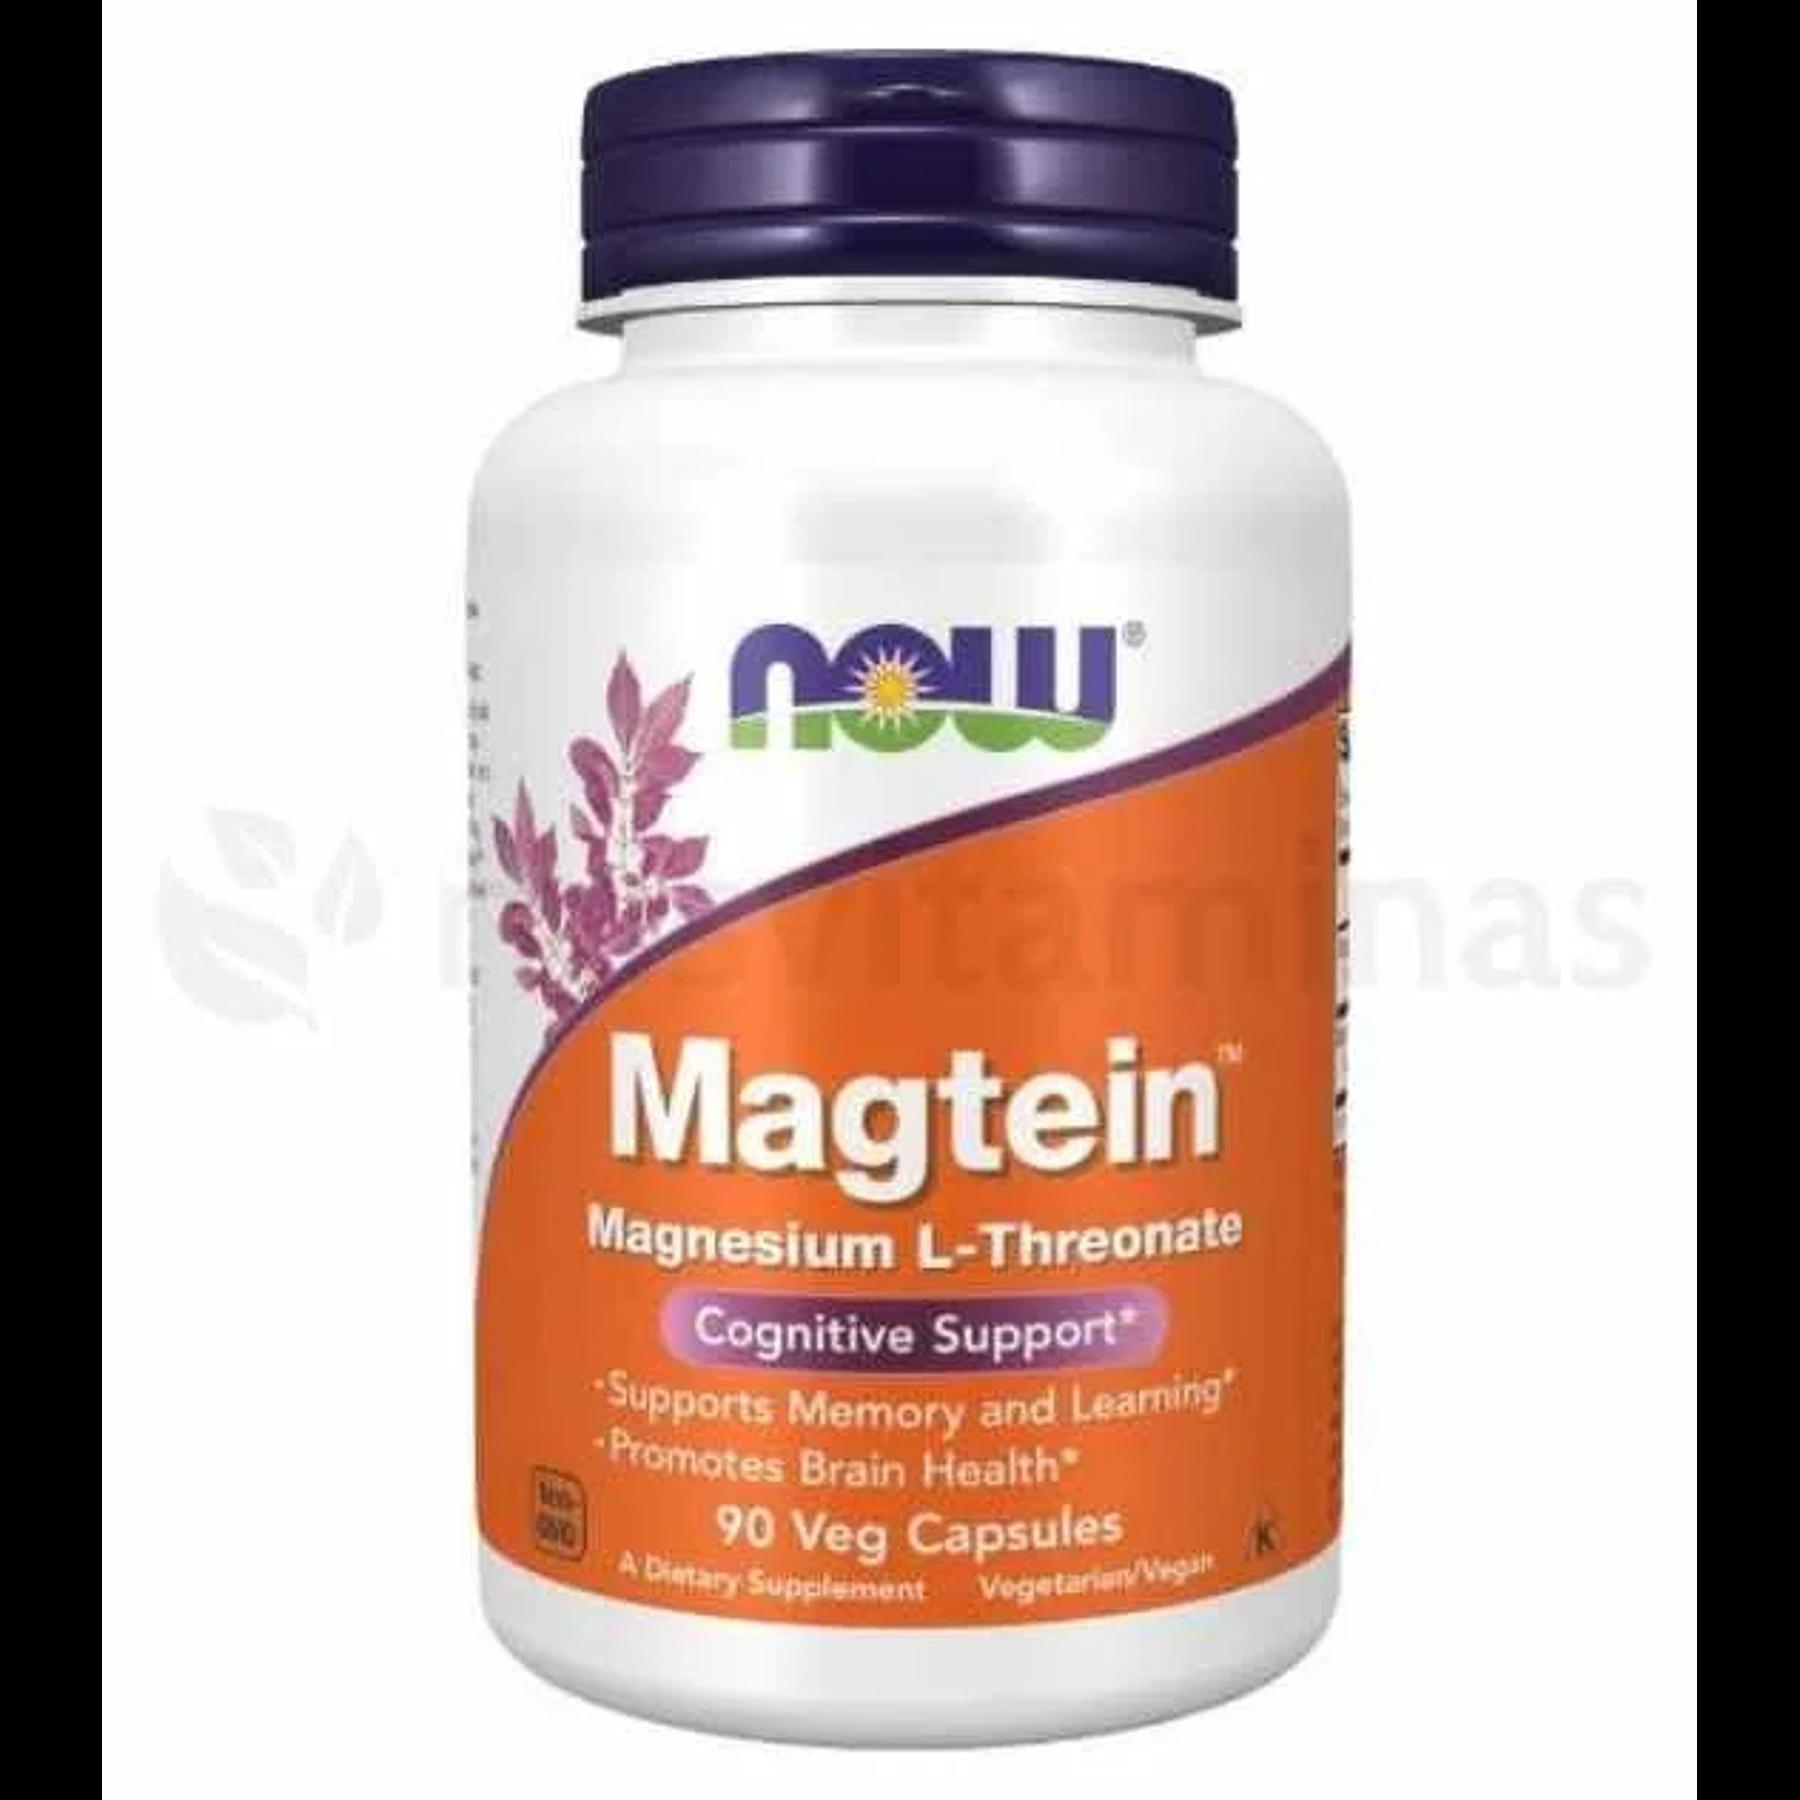 Magtein Magnesium L-Threonate Now